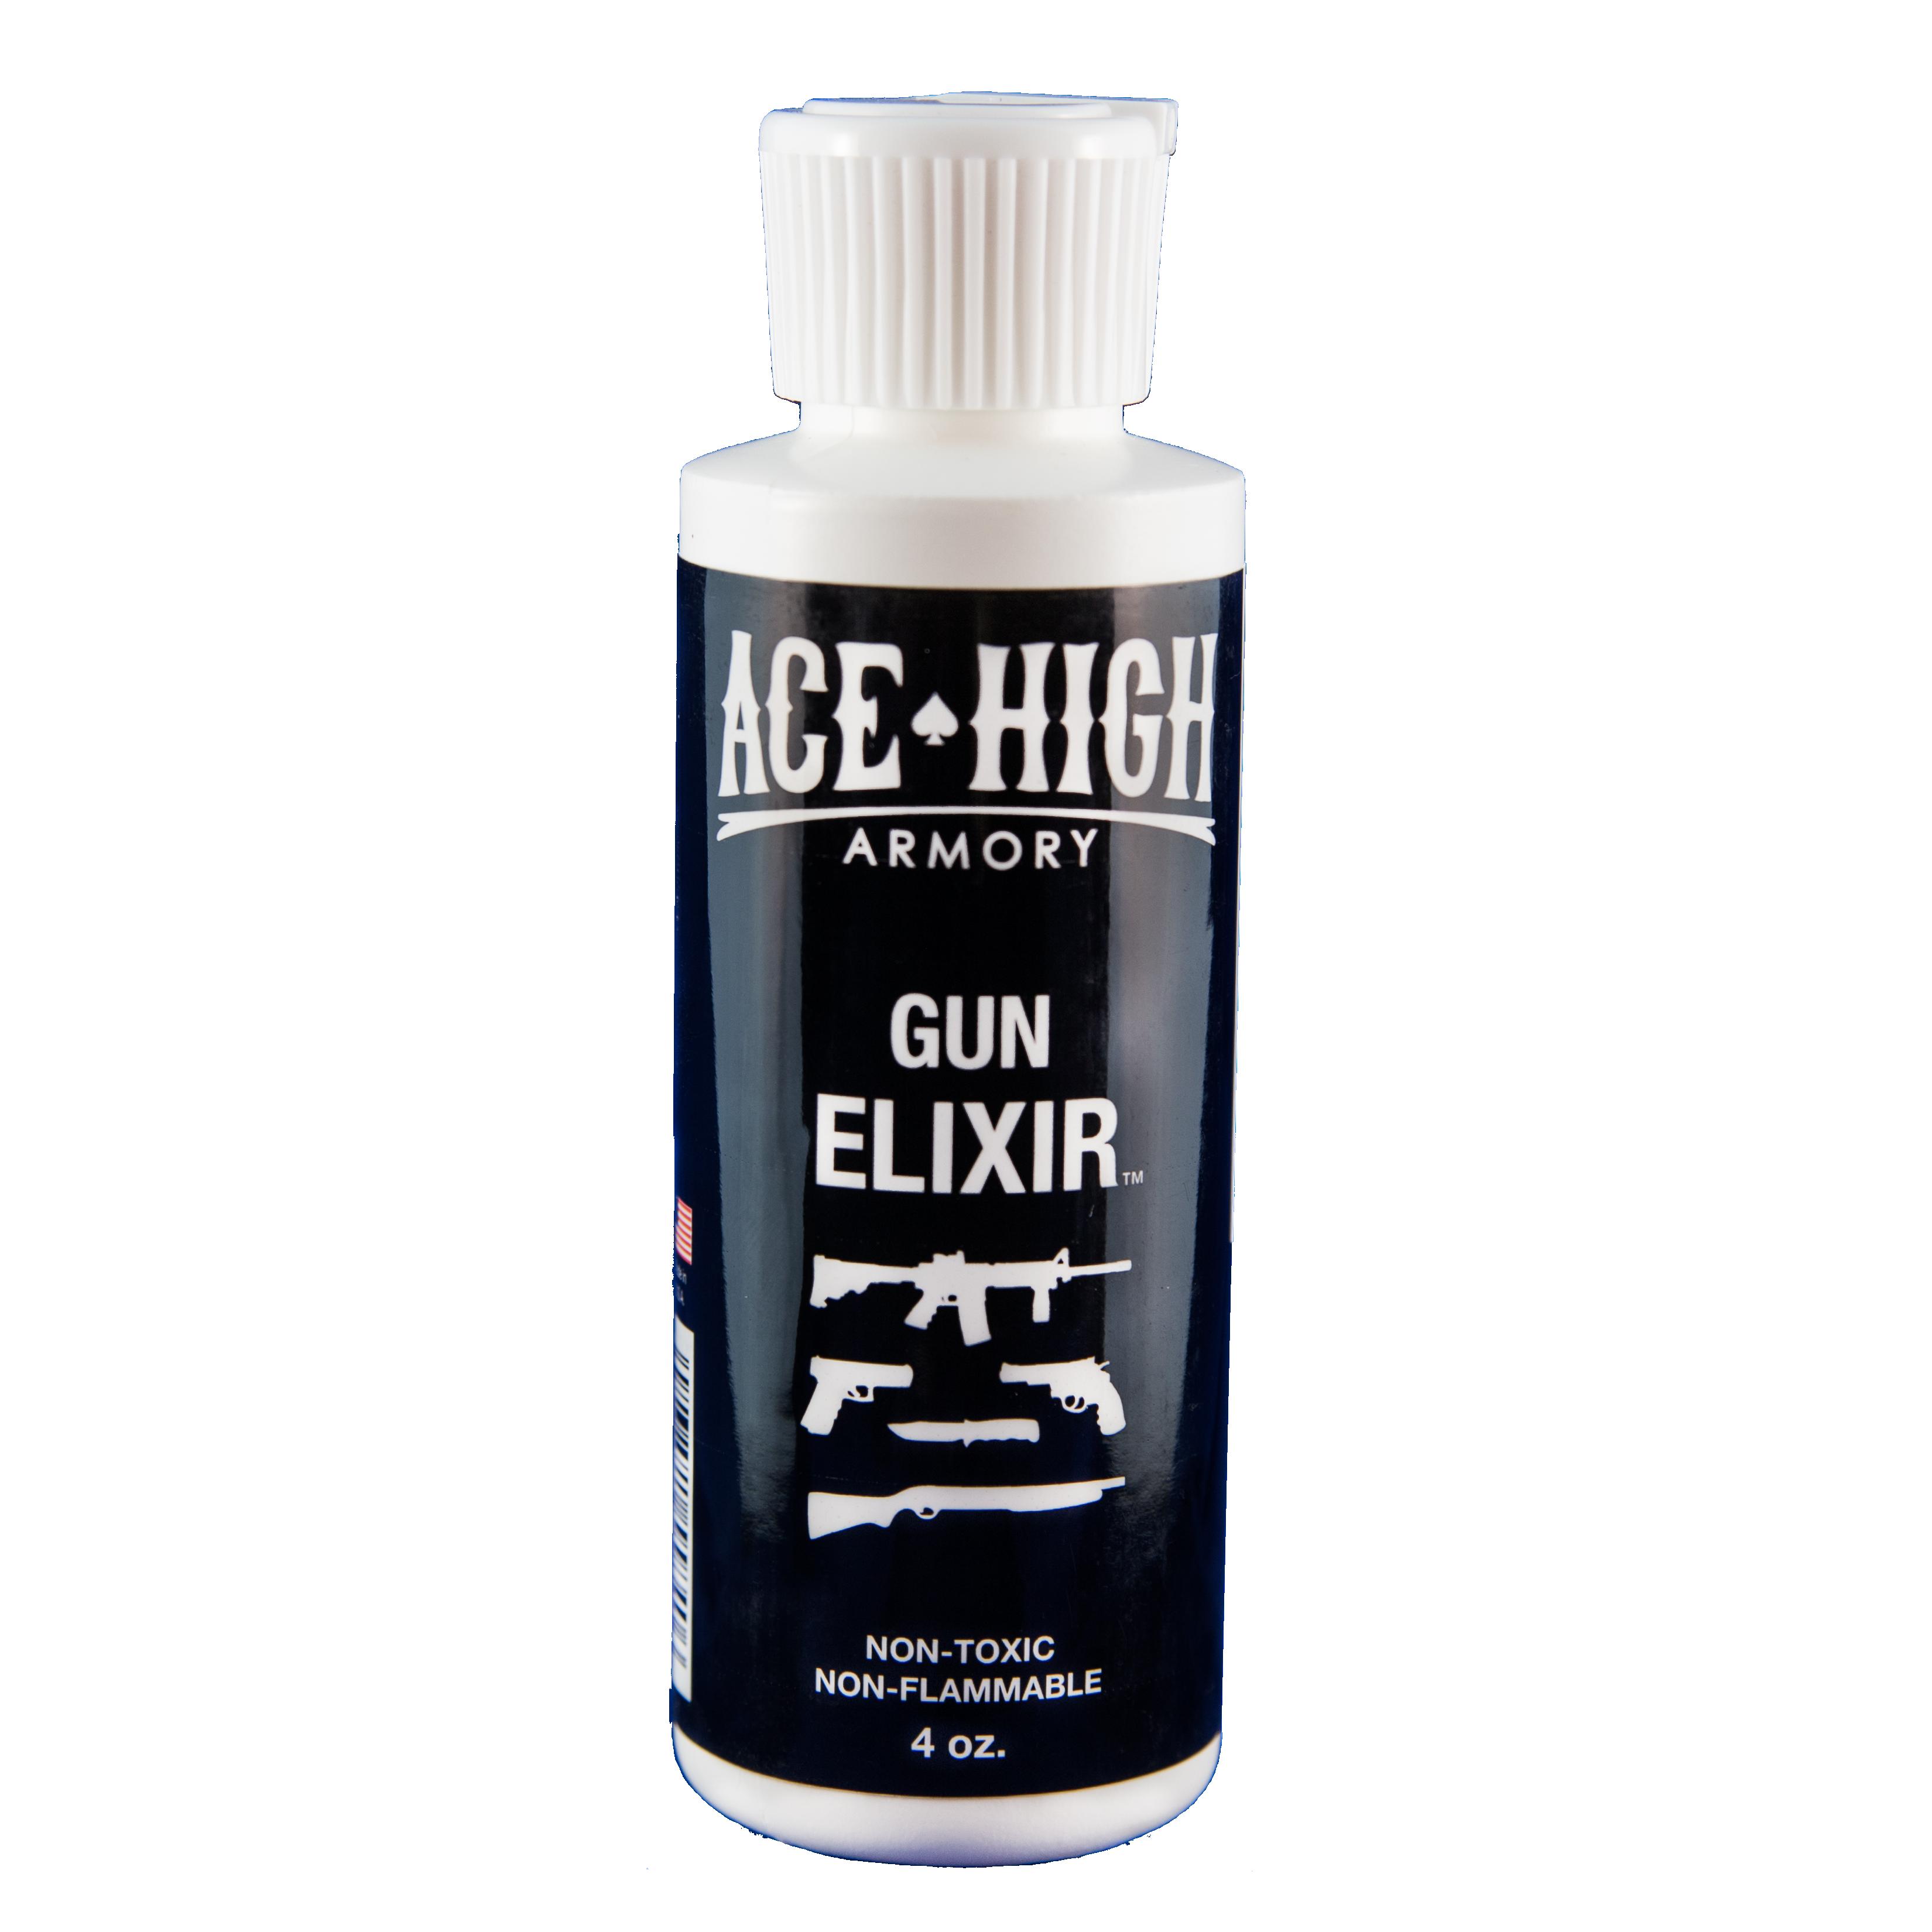 Gun-Elixir